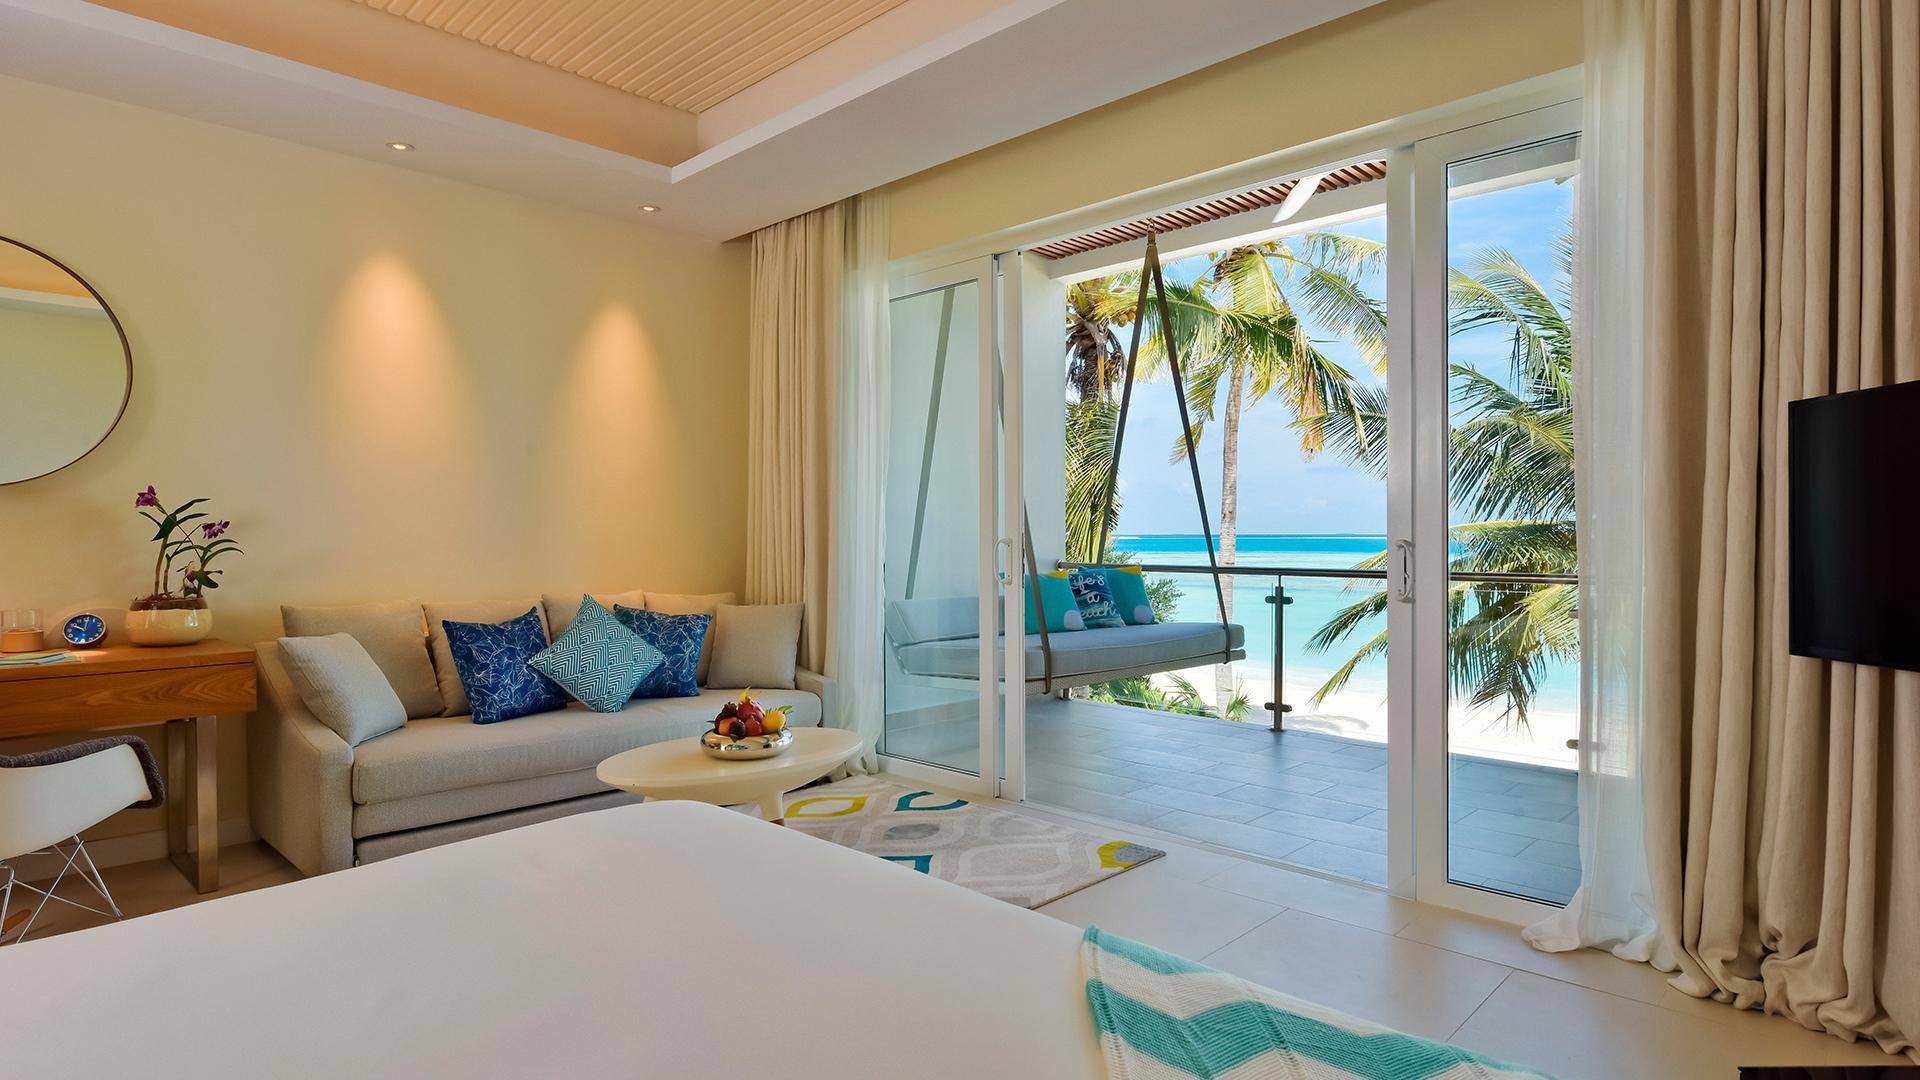 Sky Studio image 1 at Kandima Maldives by null, Central Province, Maldives